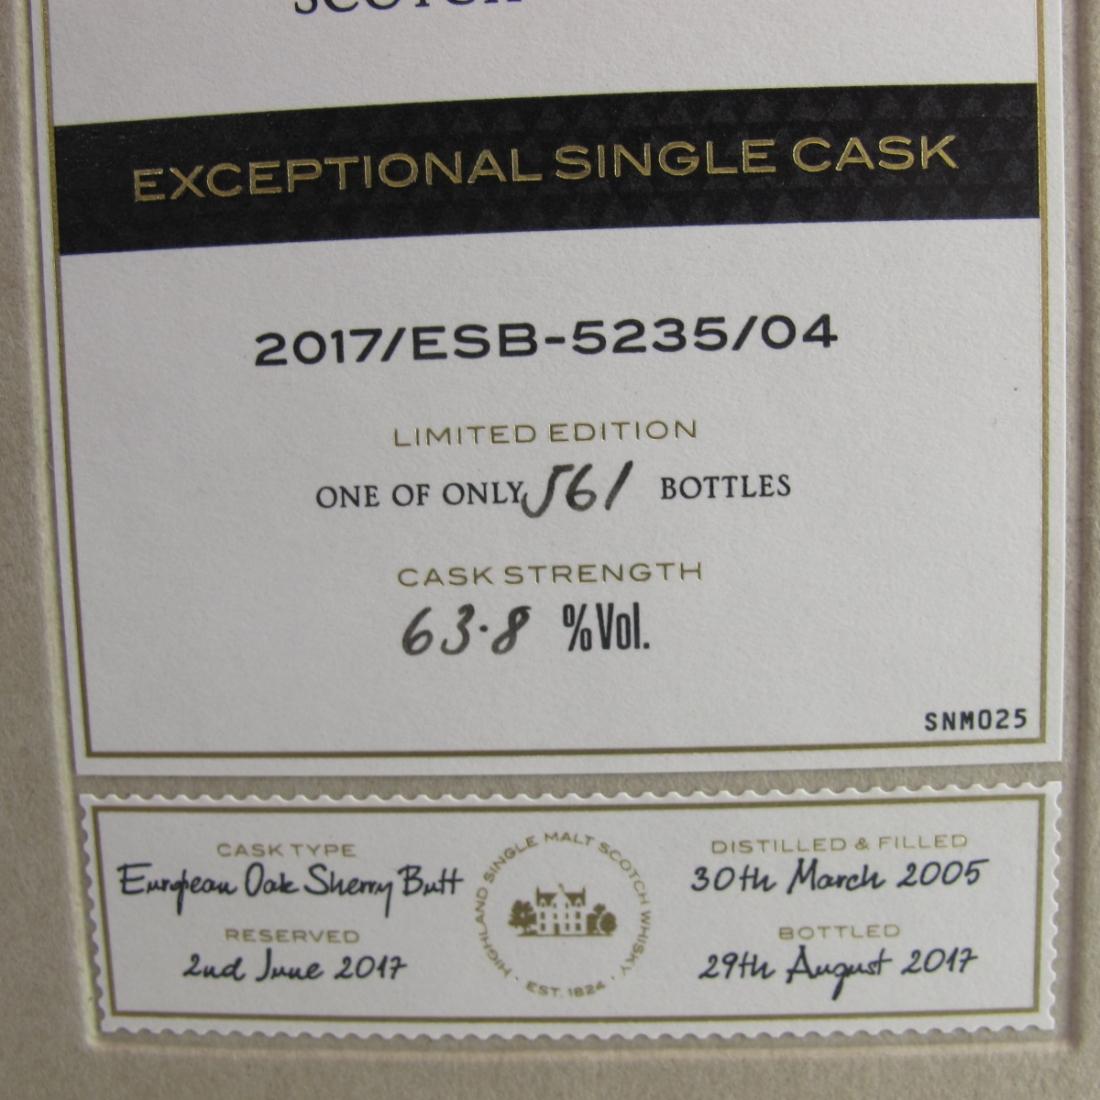 Macallan 2005 Exceptional Cask #5235-04